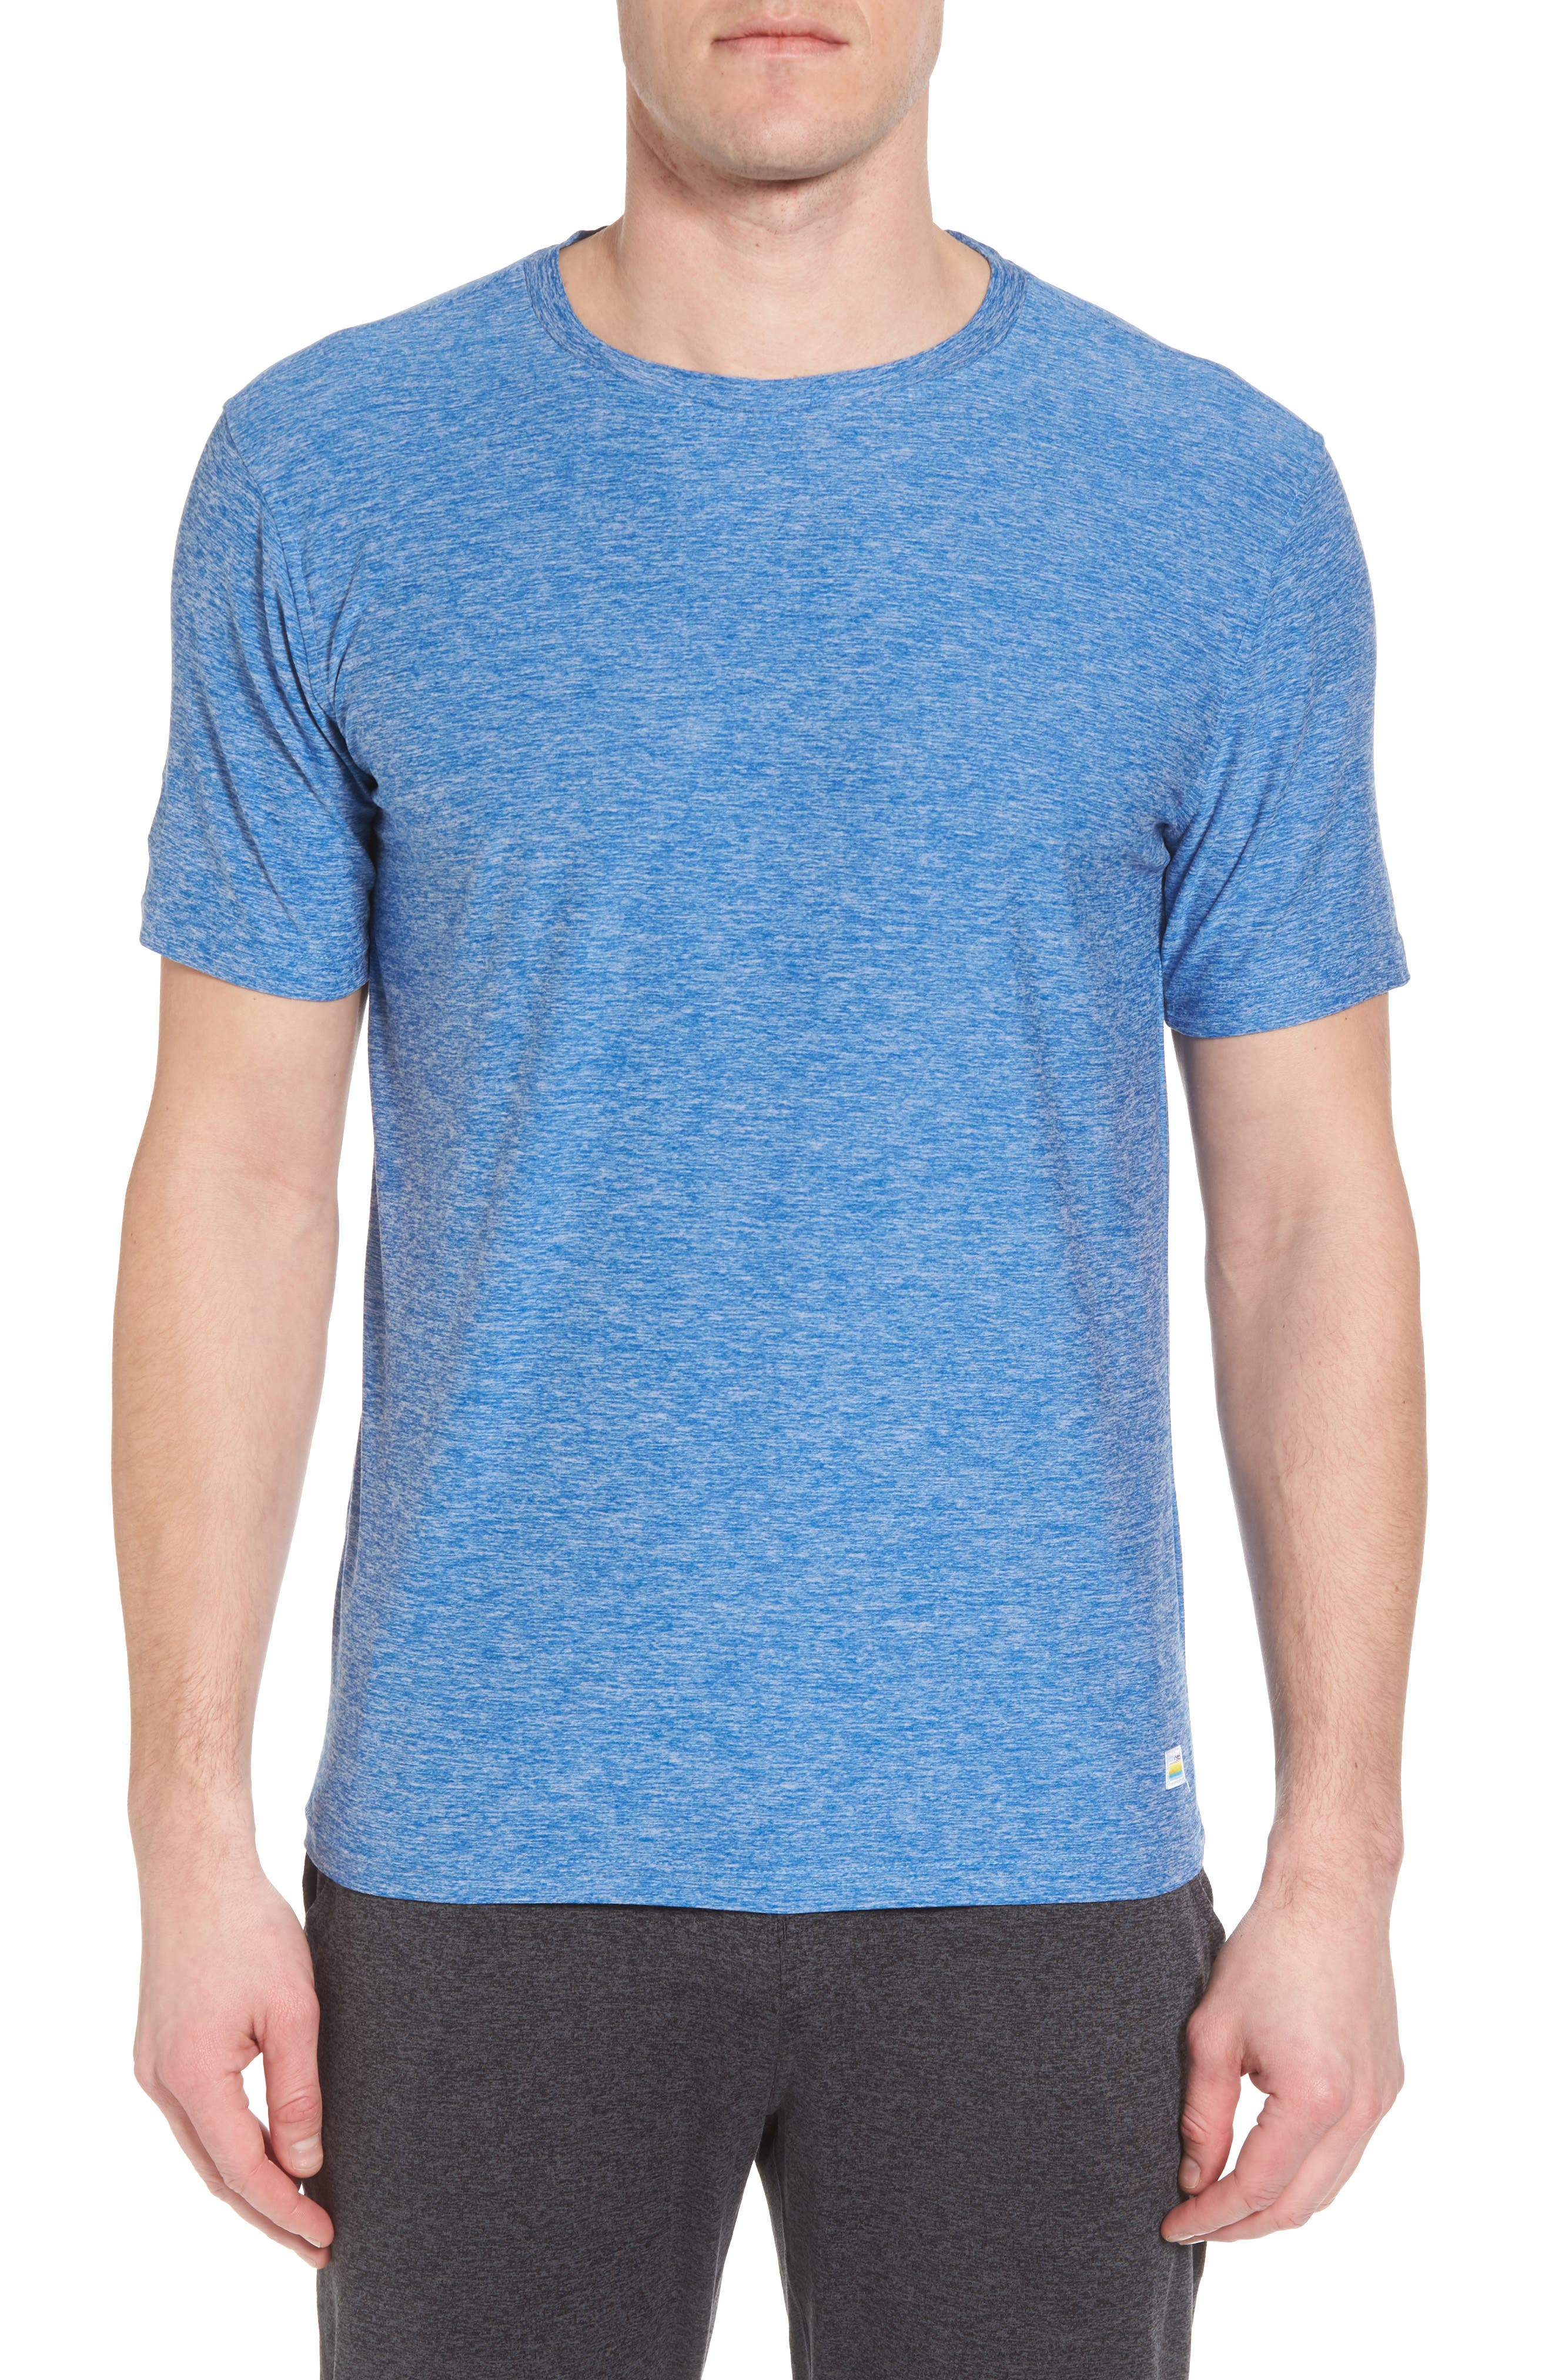 Vuori Strato Slim Fit Crewneck T-Shirt, Blue